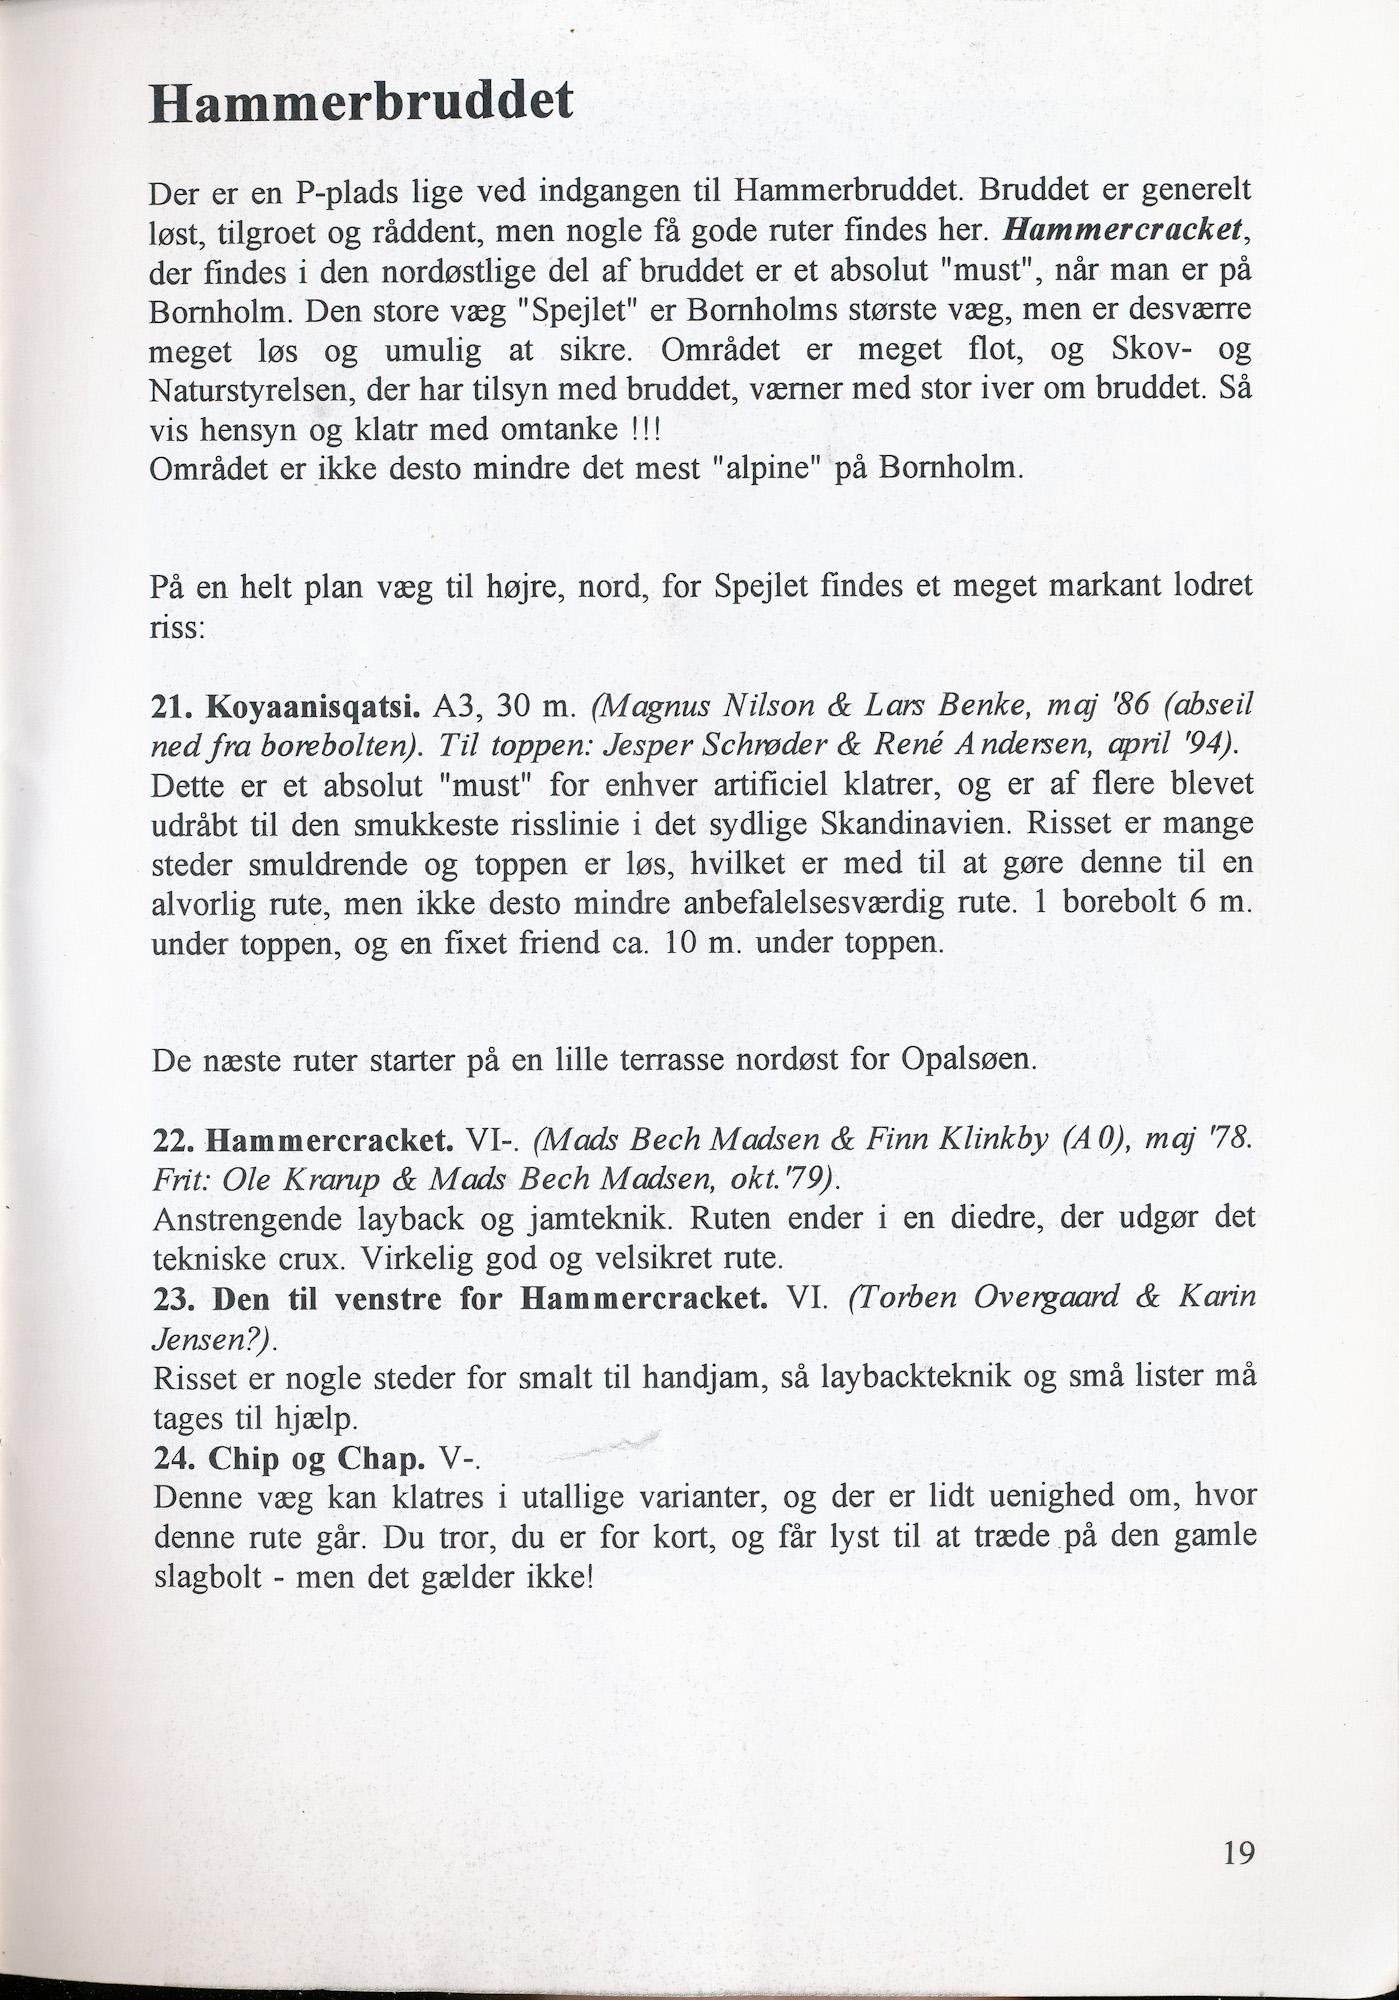 50 udvalgte ruter paa bornholm 1995 19.jpg